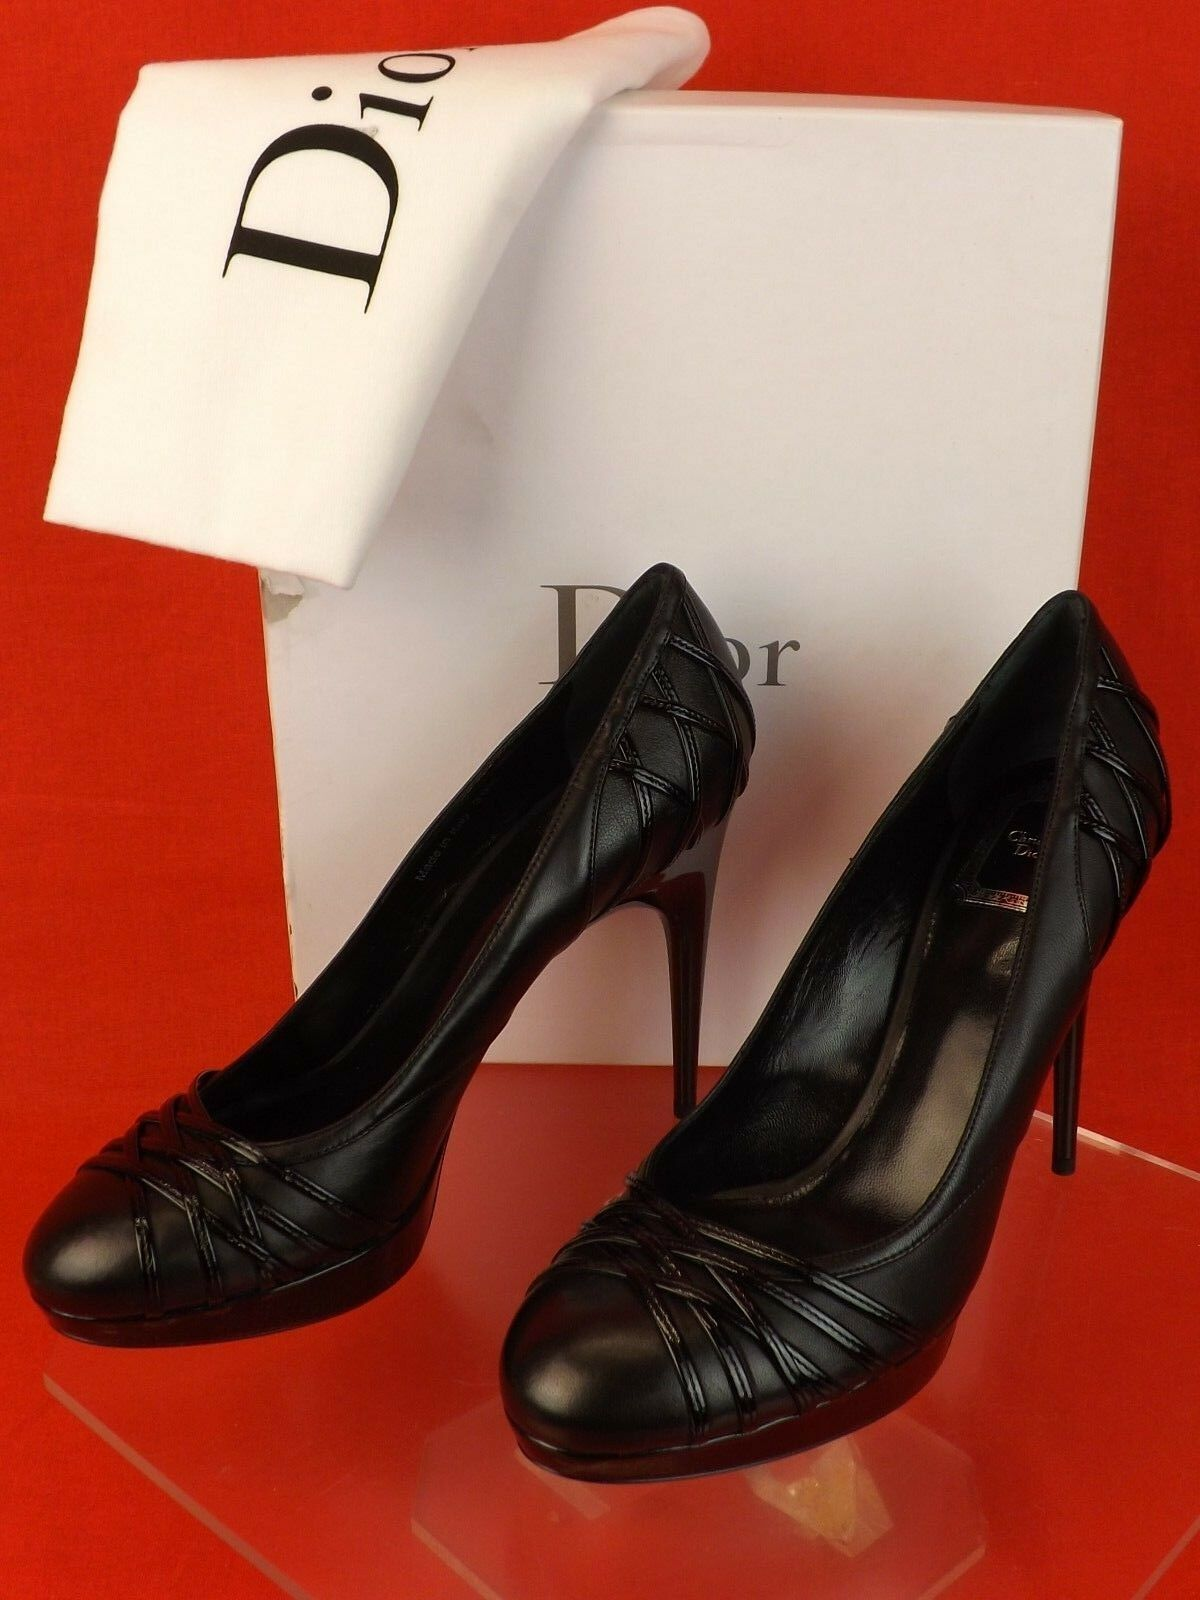 Neuf dans sa boîte Christian Christian Christian Dior en cuir noir KARENINE Piste Escarpins 39.5 0f14f8